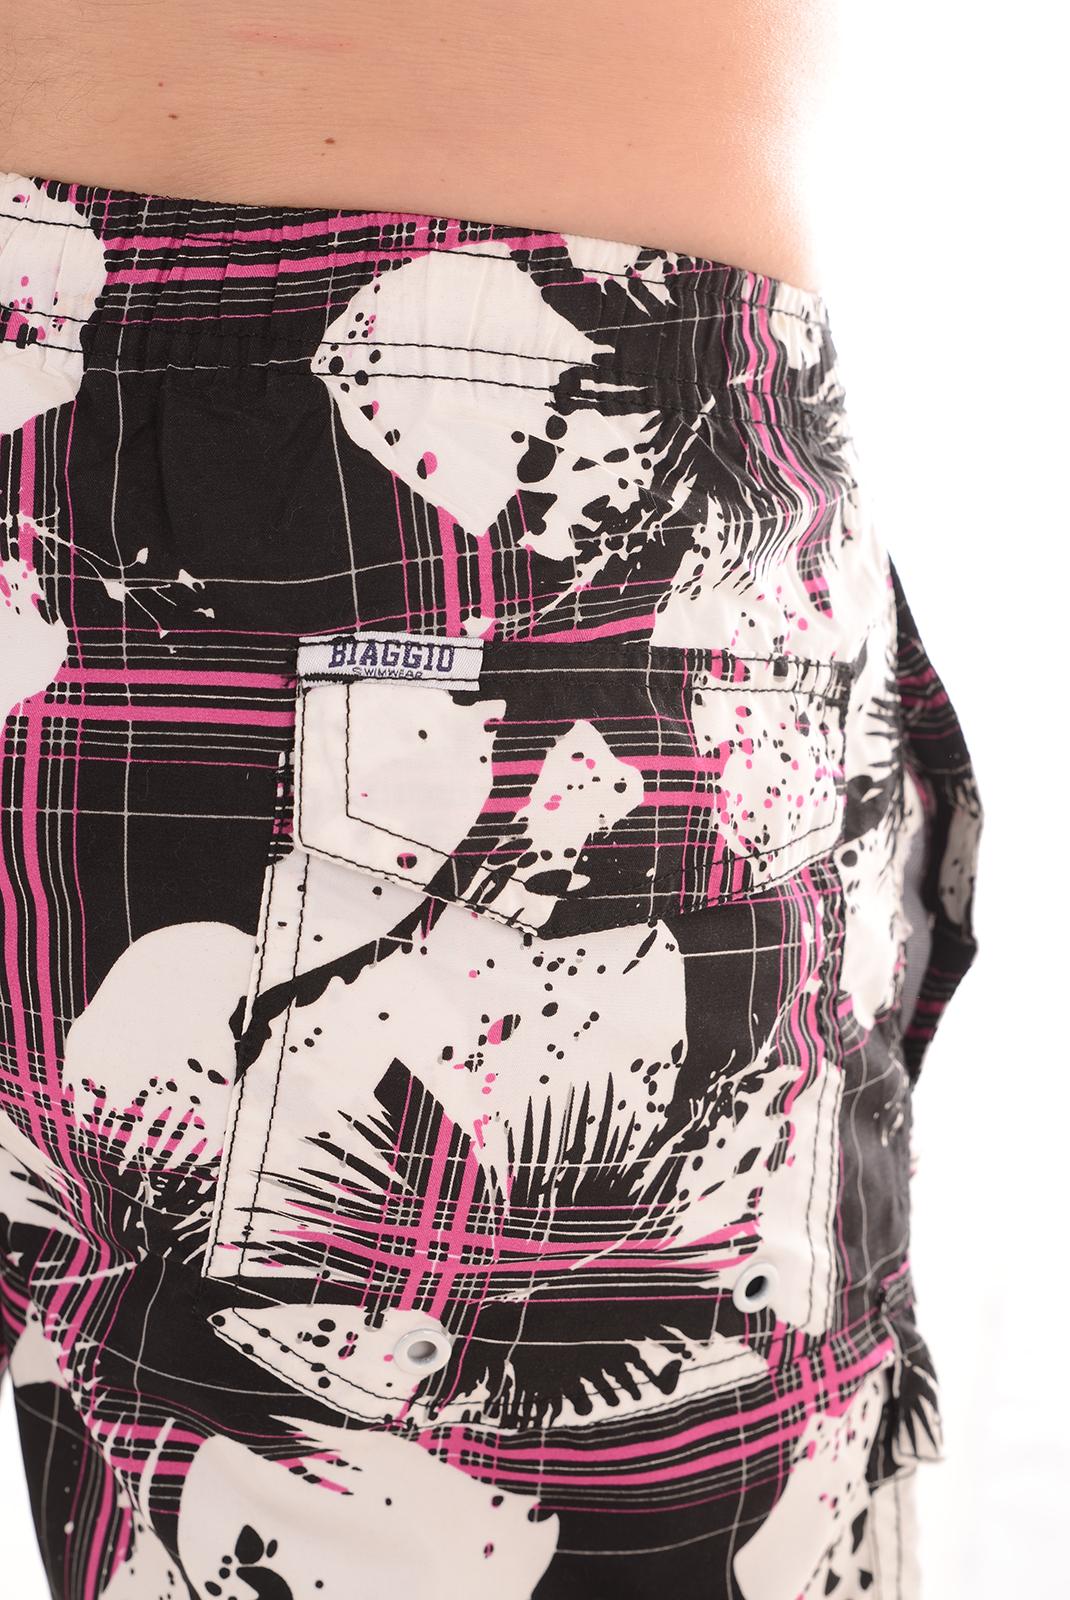 HOMME  Biaggio jeans BABYBLUERUS BLACK